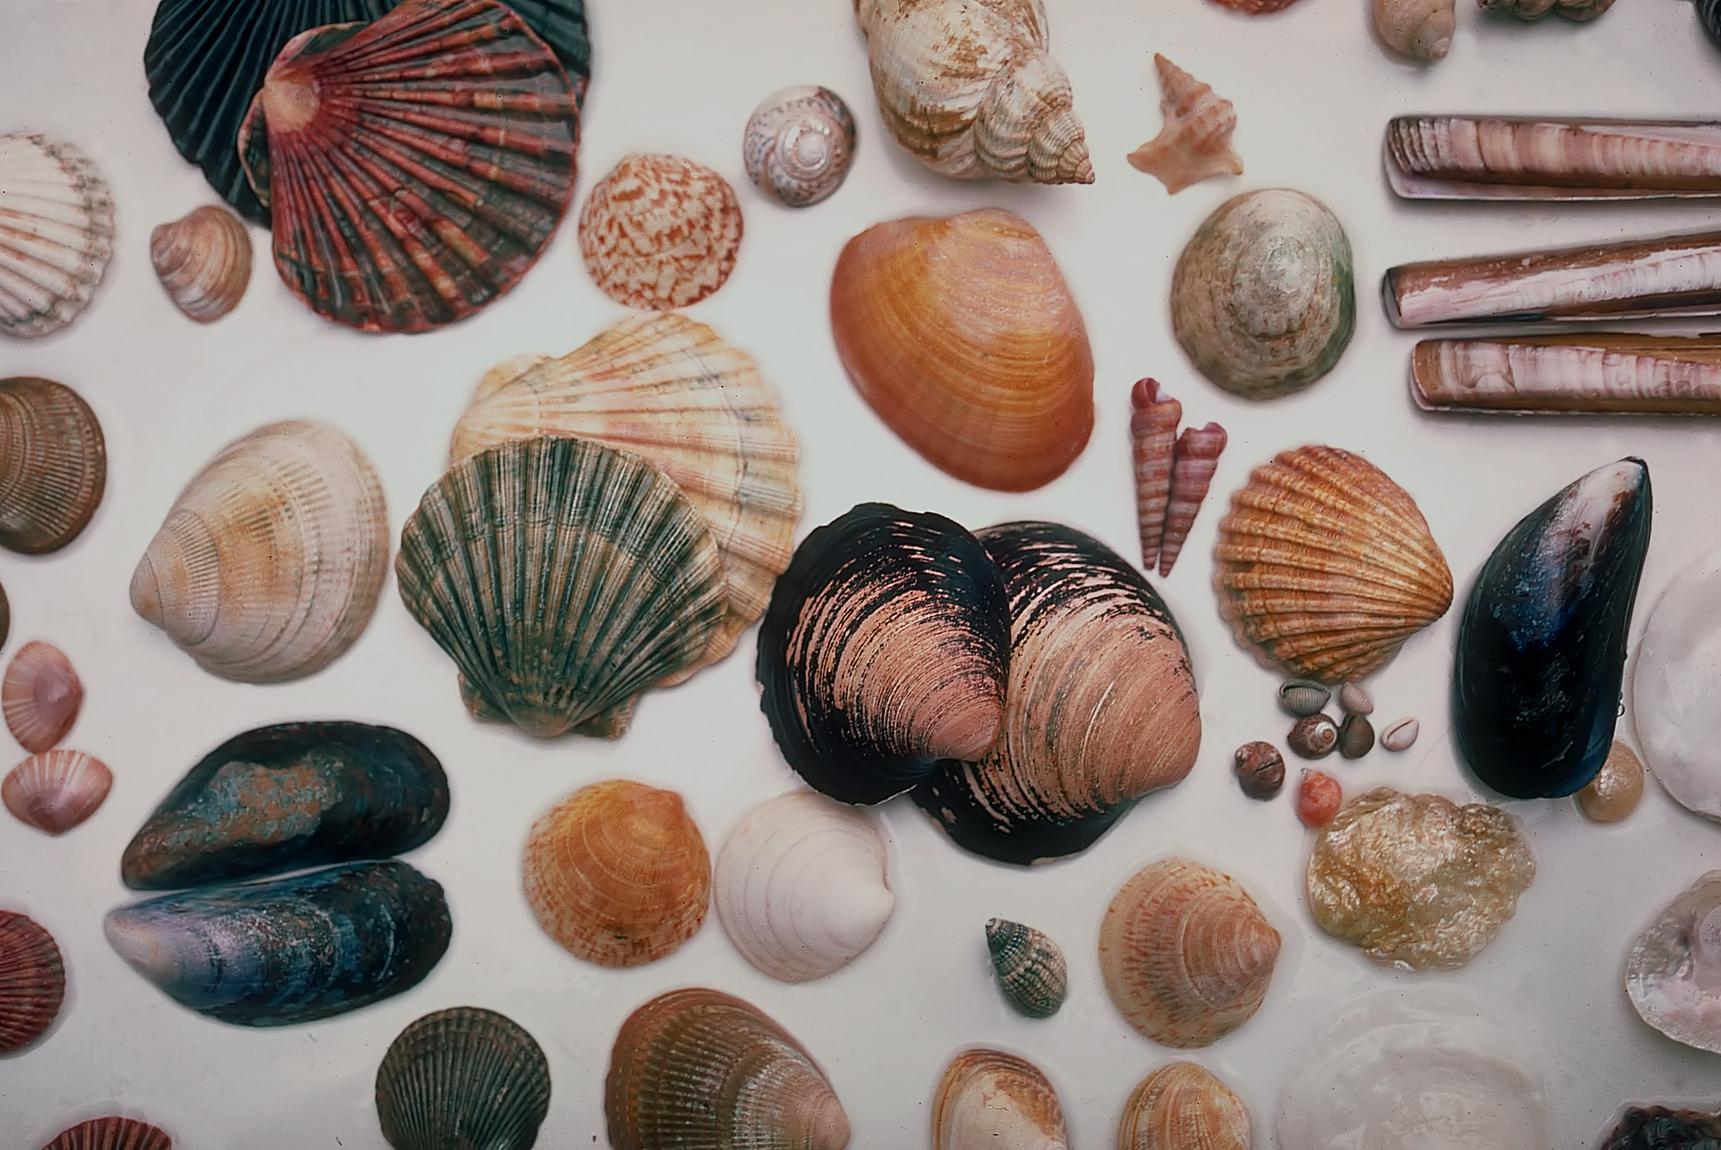 Alice Garg National Seashell Museum